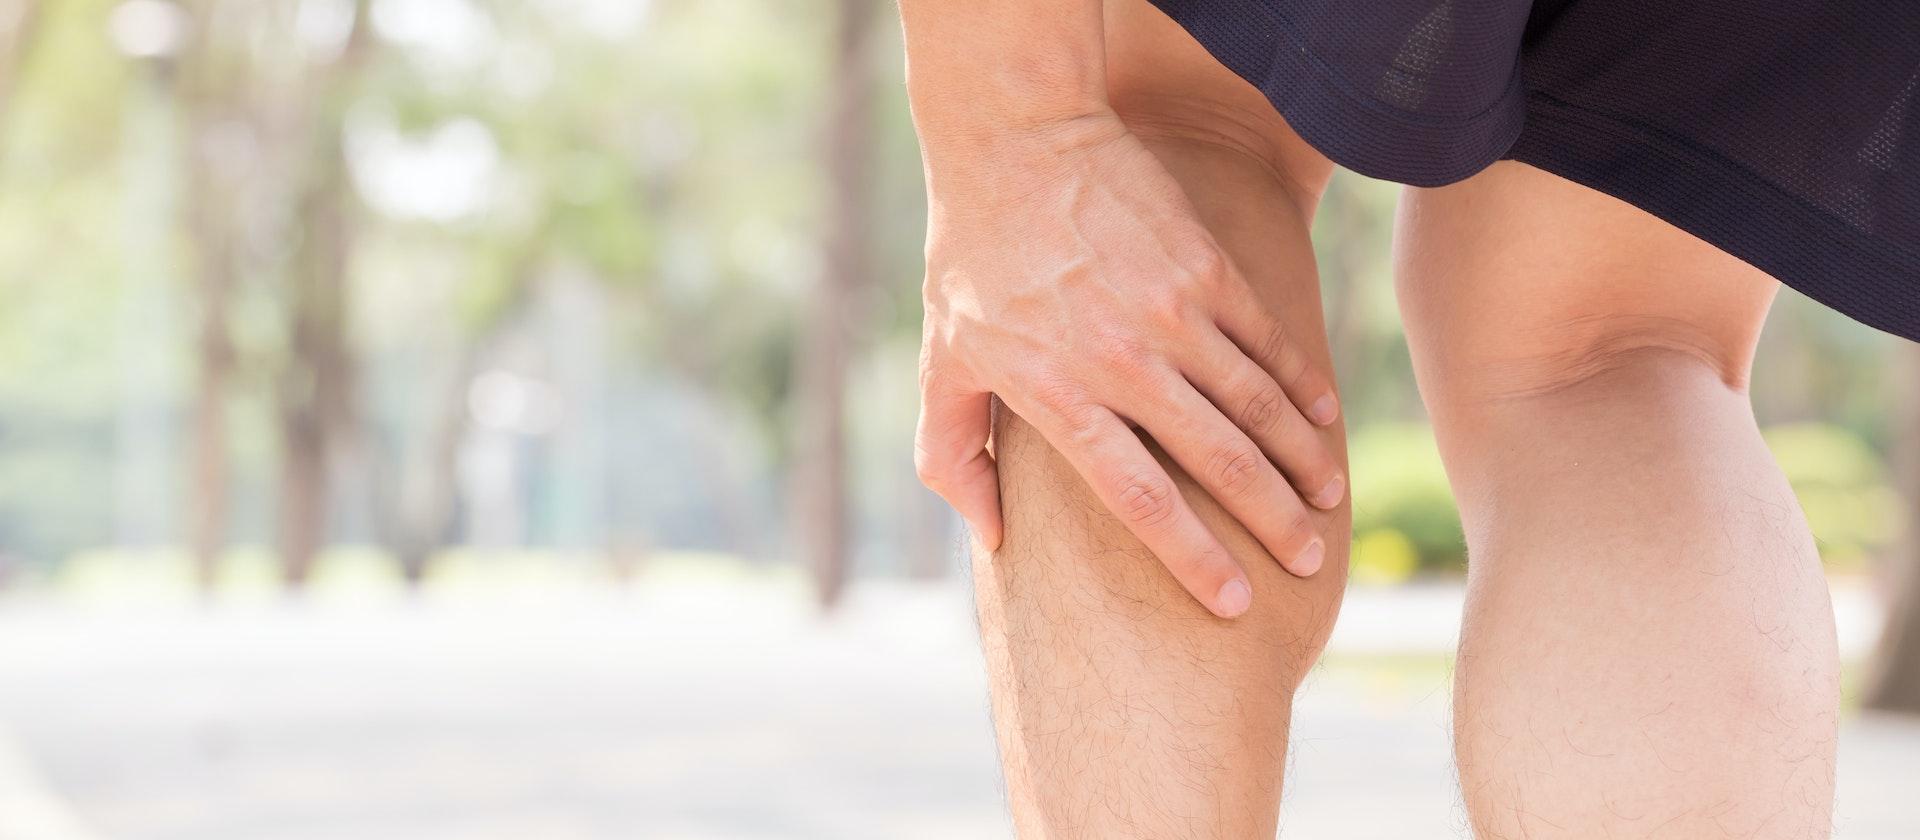 Why Do My Calves Hurt Common Calf Pain Causes Treatments Buoy